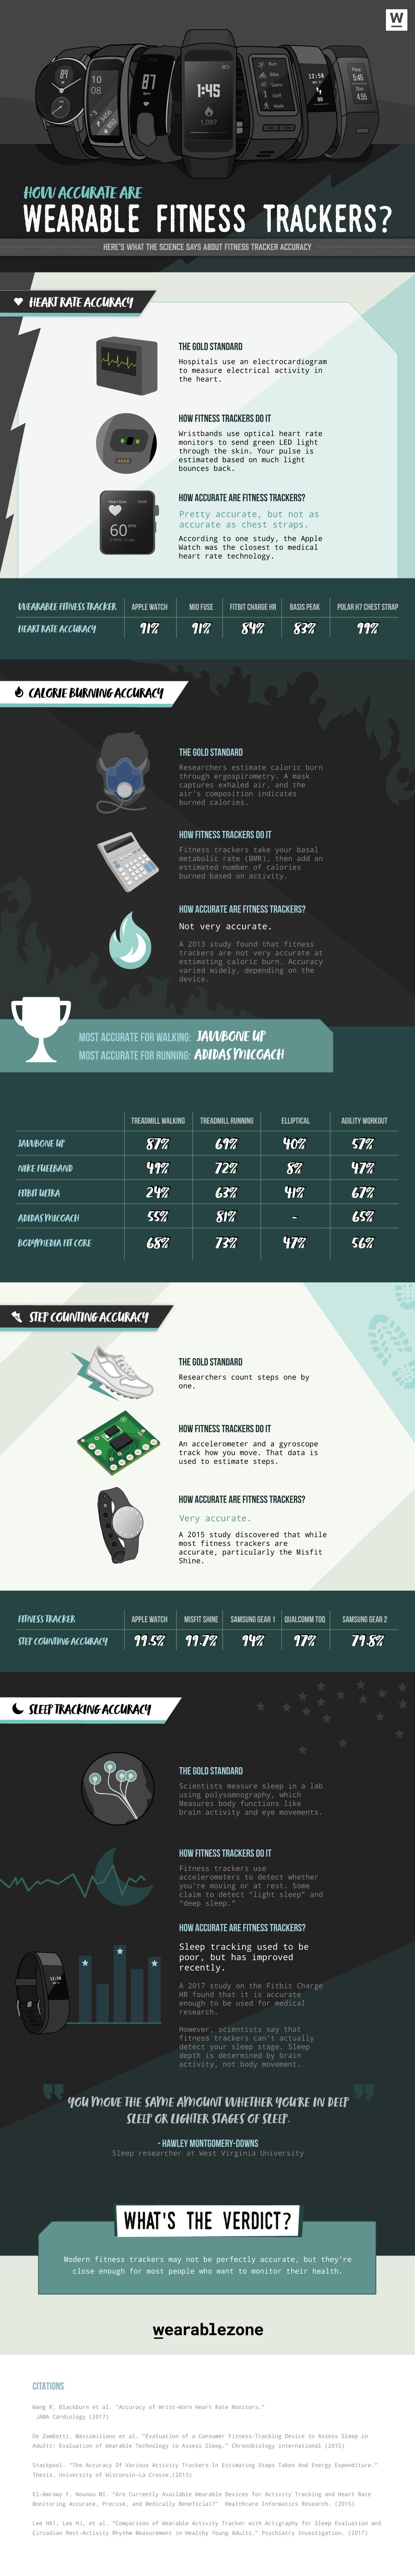 Garmin Vivosmart HR vs. Fitbit Alta HR: Which One Comes Out On Top ...